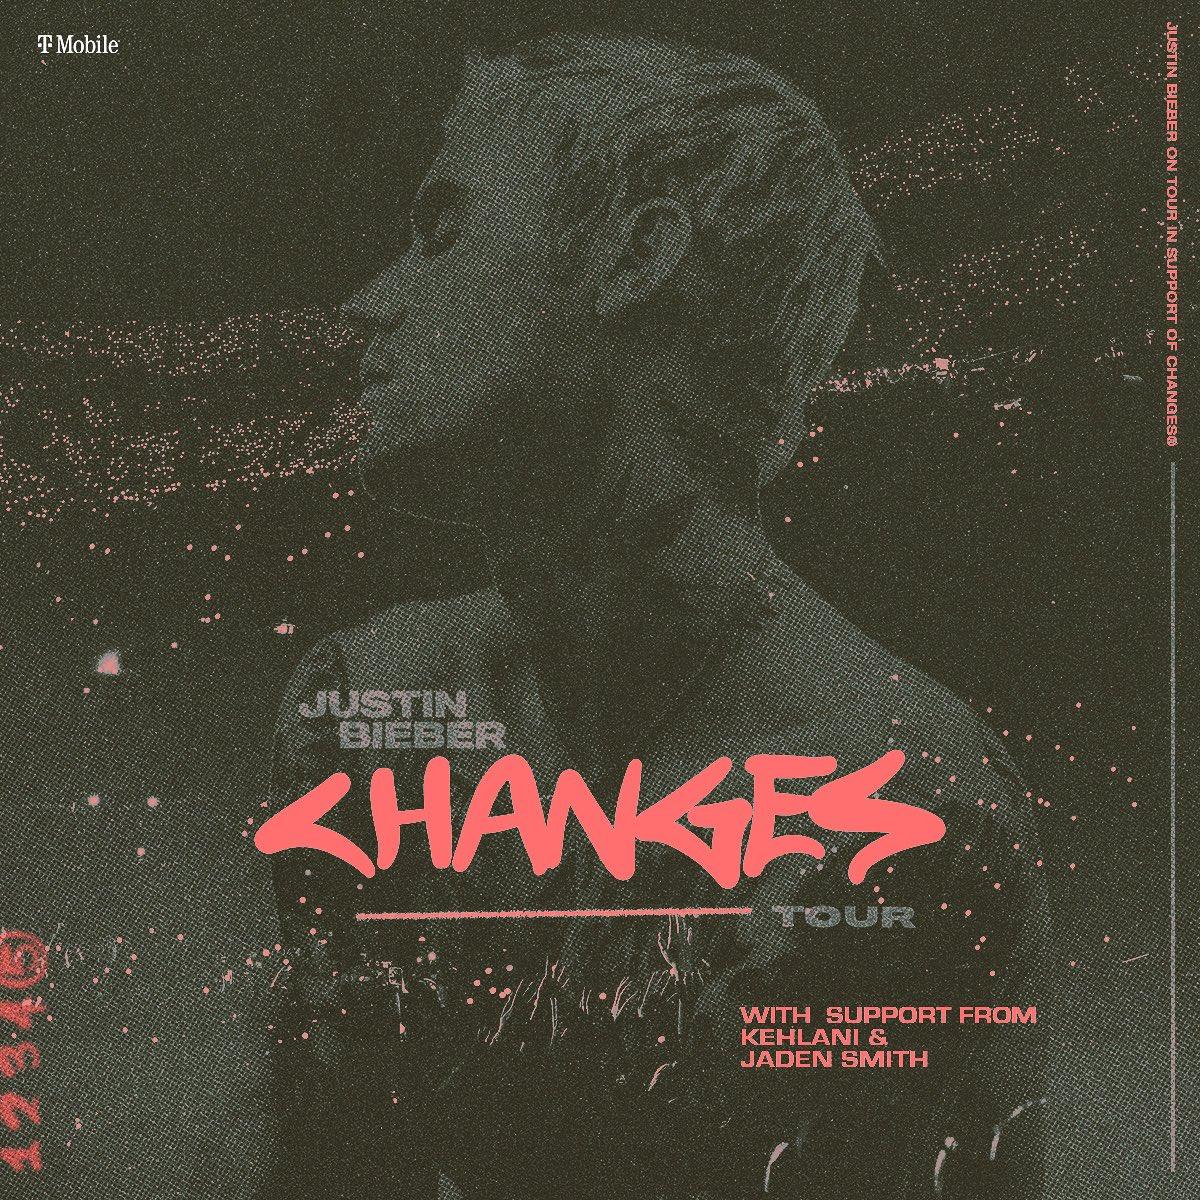 Here we go: #ChangesTour  tickets on sale tmrw noon local  http://justinbiebermusic.com